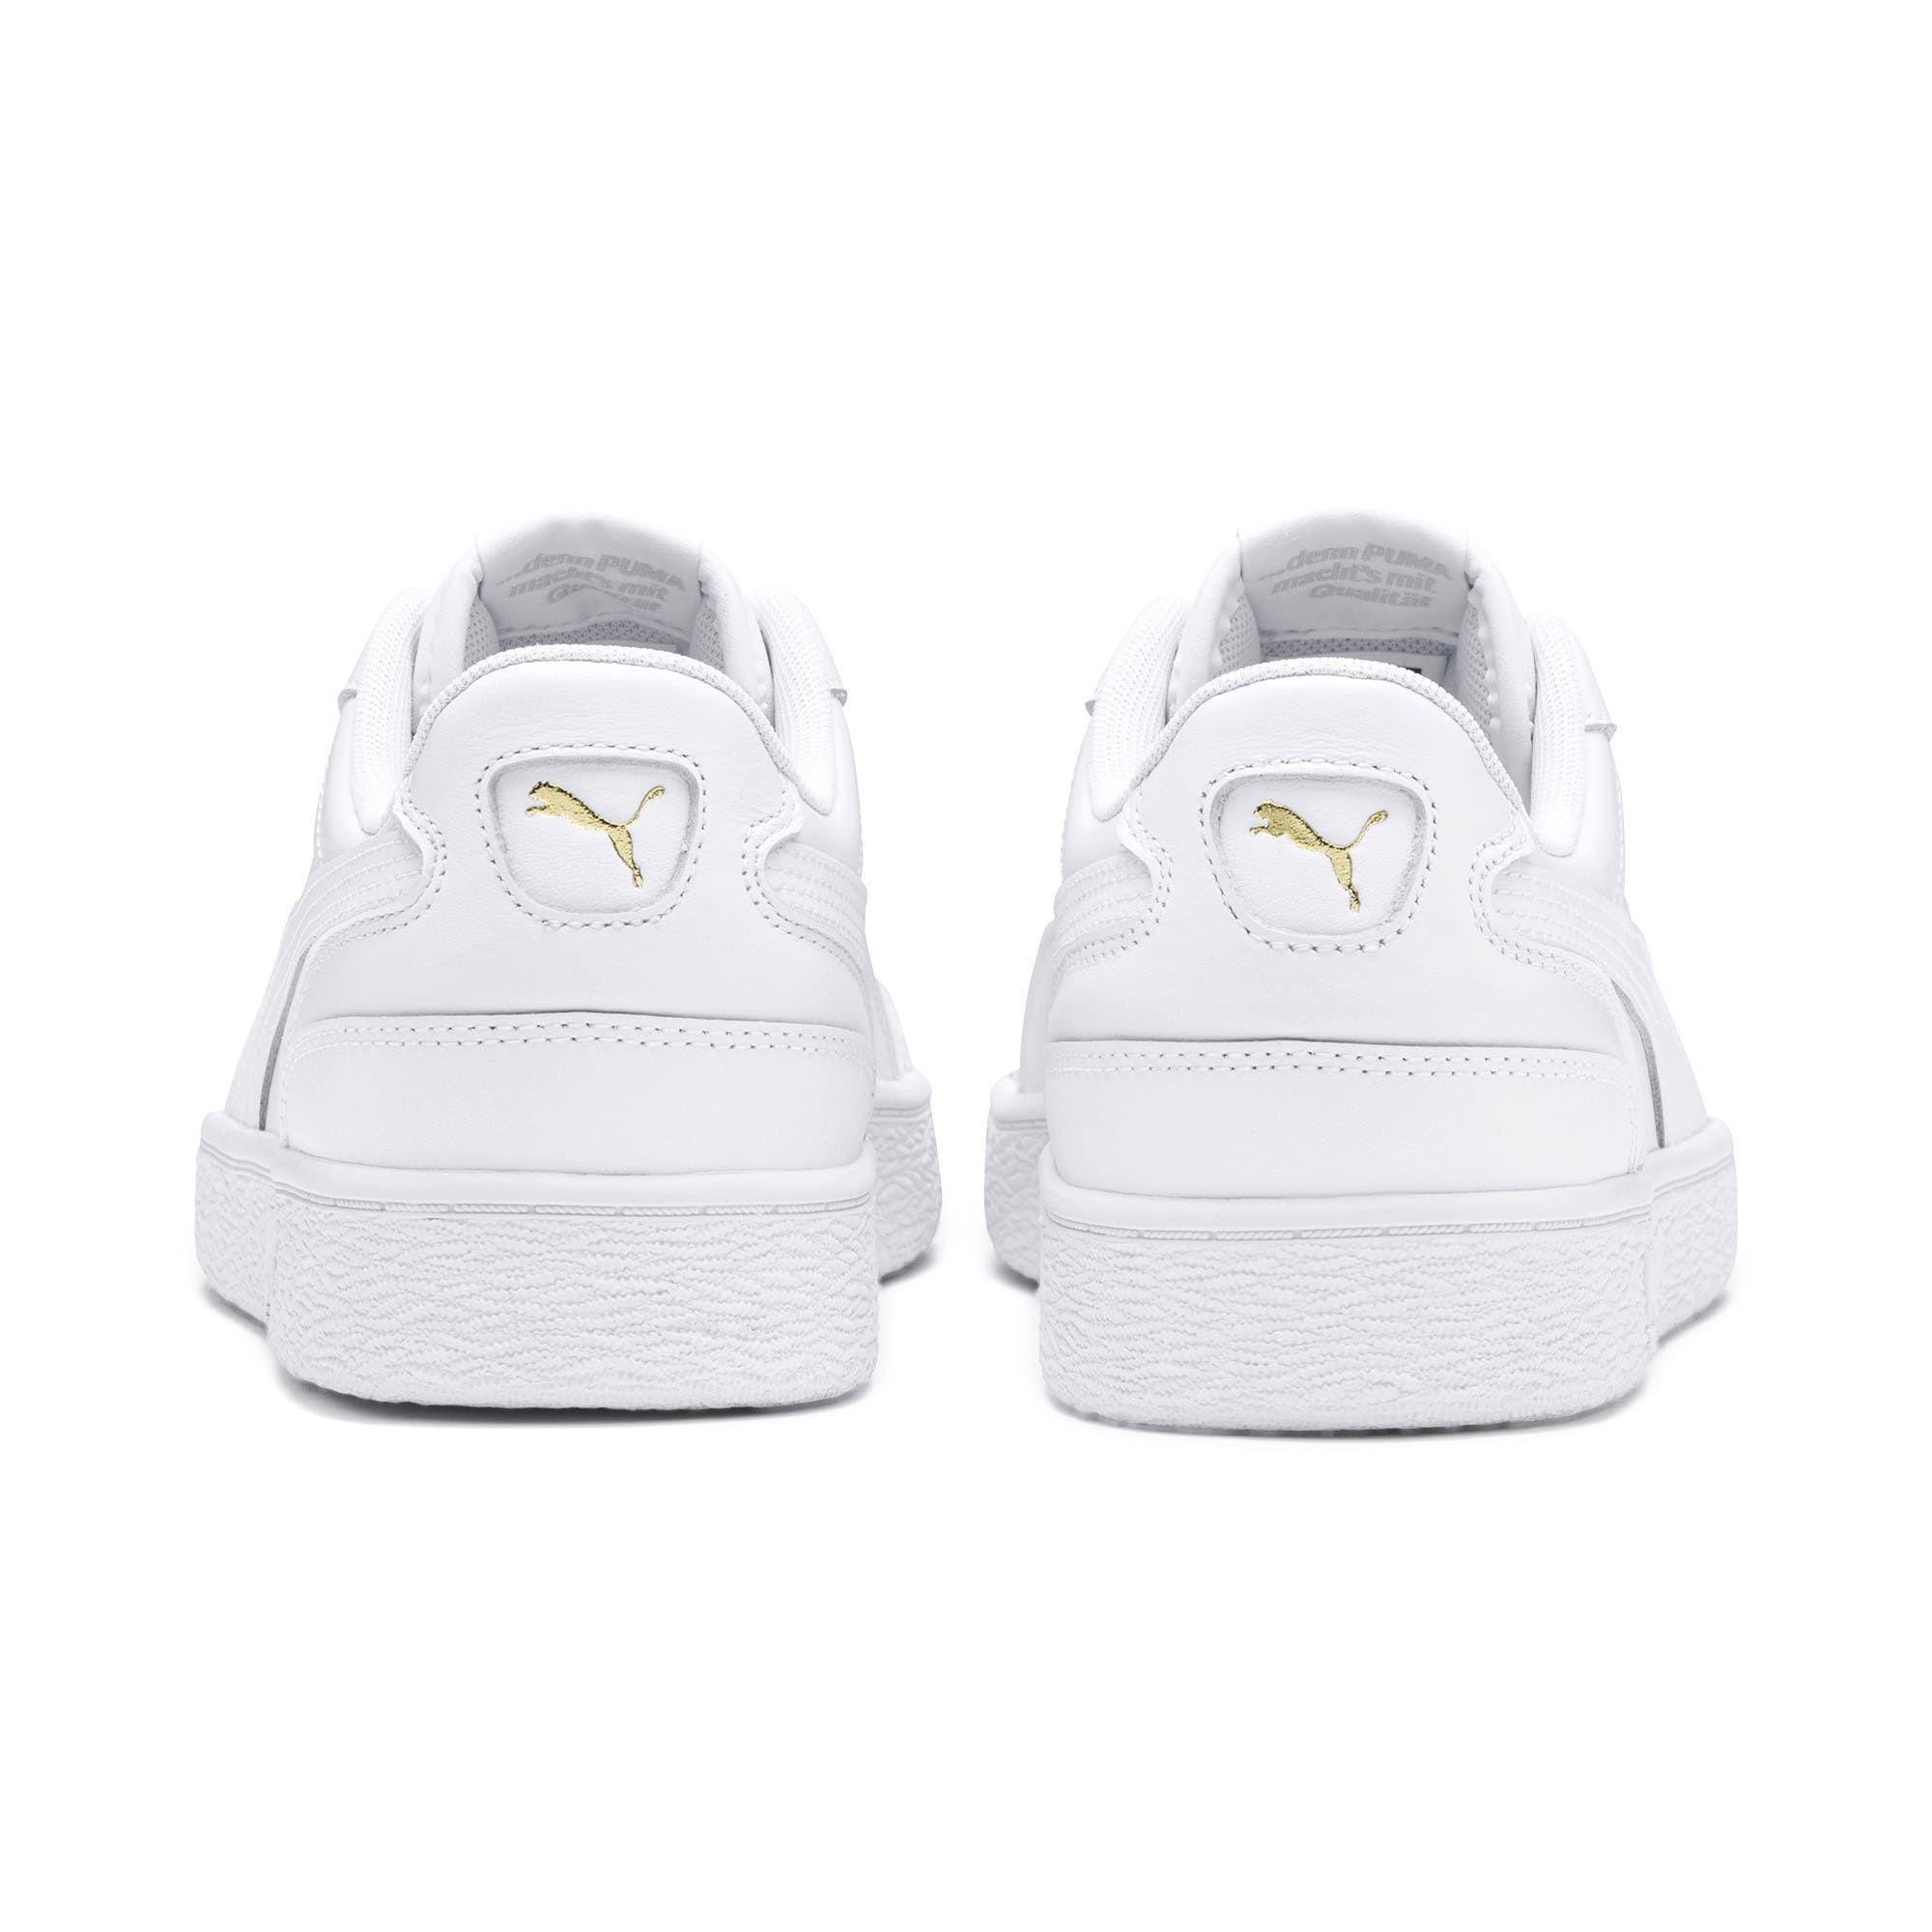 Puma Ralph Sampson LO Sneakers Puma BlackPuma WhitePuma White